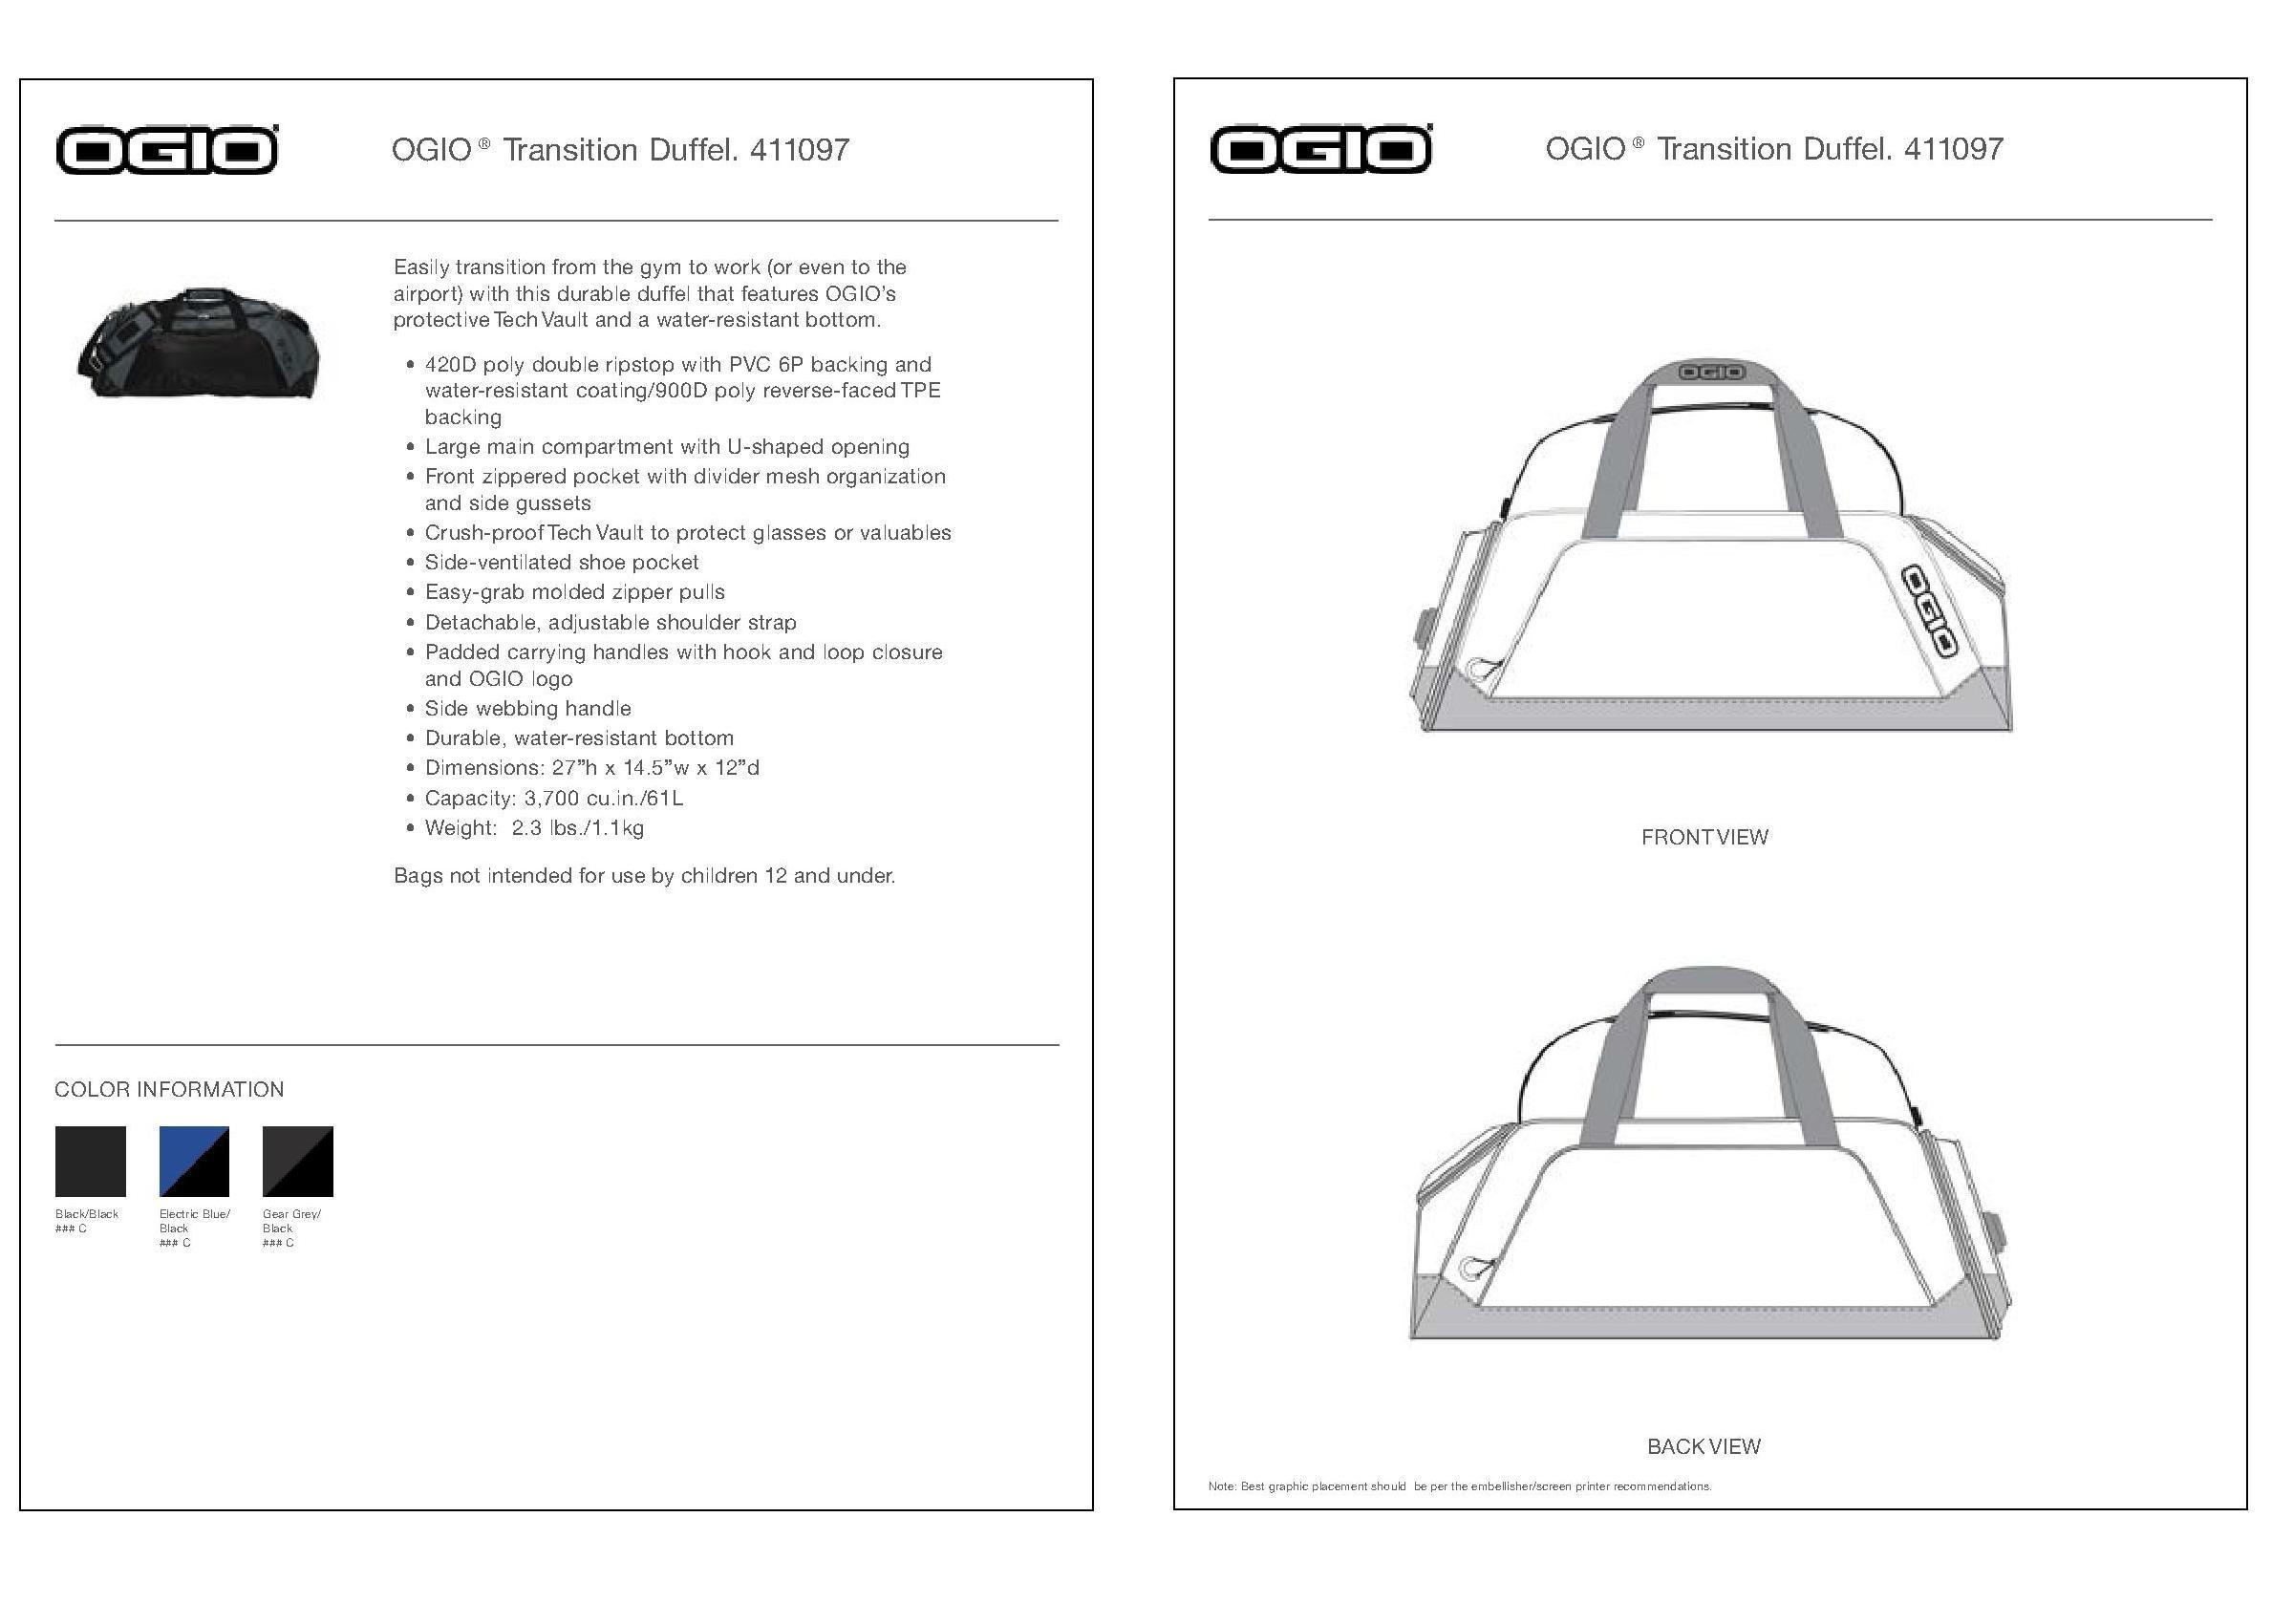 ff937a3ea15 OGIO 411097 - Transition Duffel  45.00 - Bags